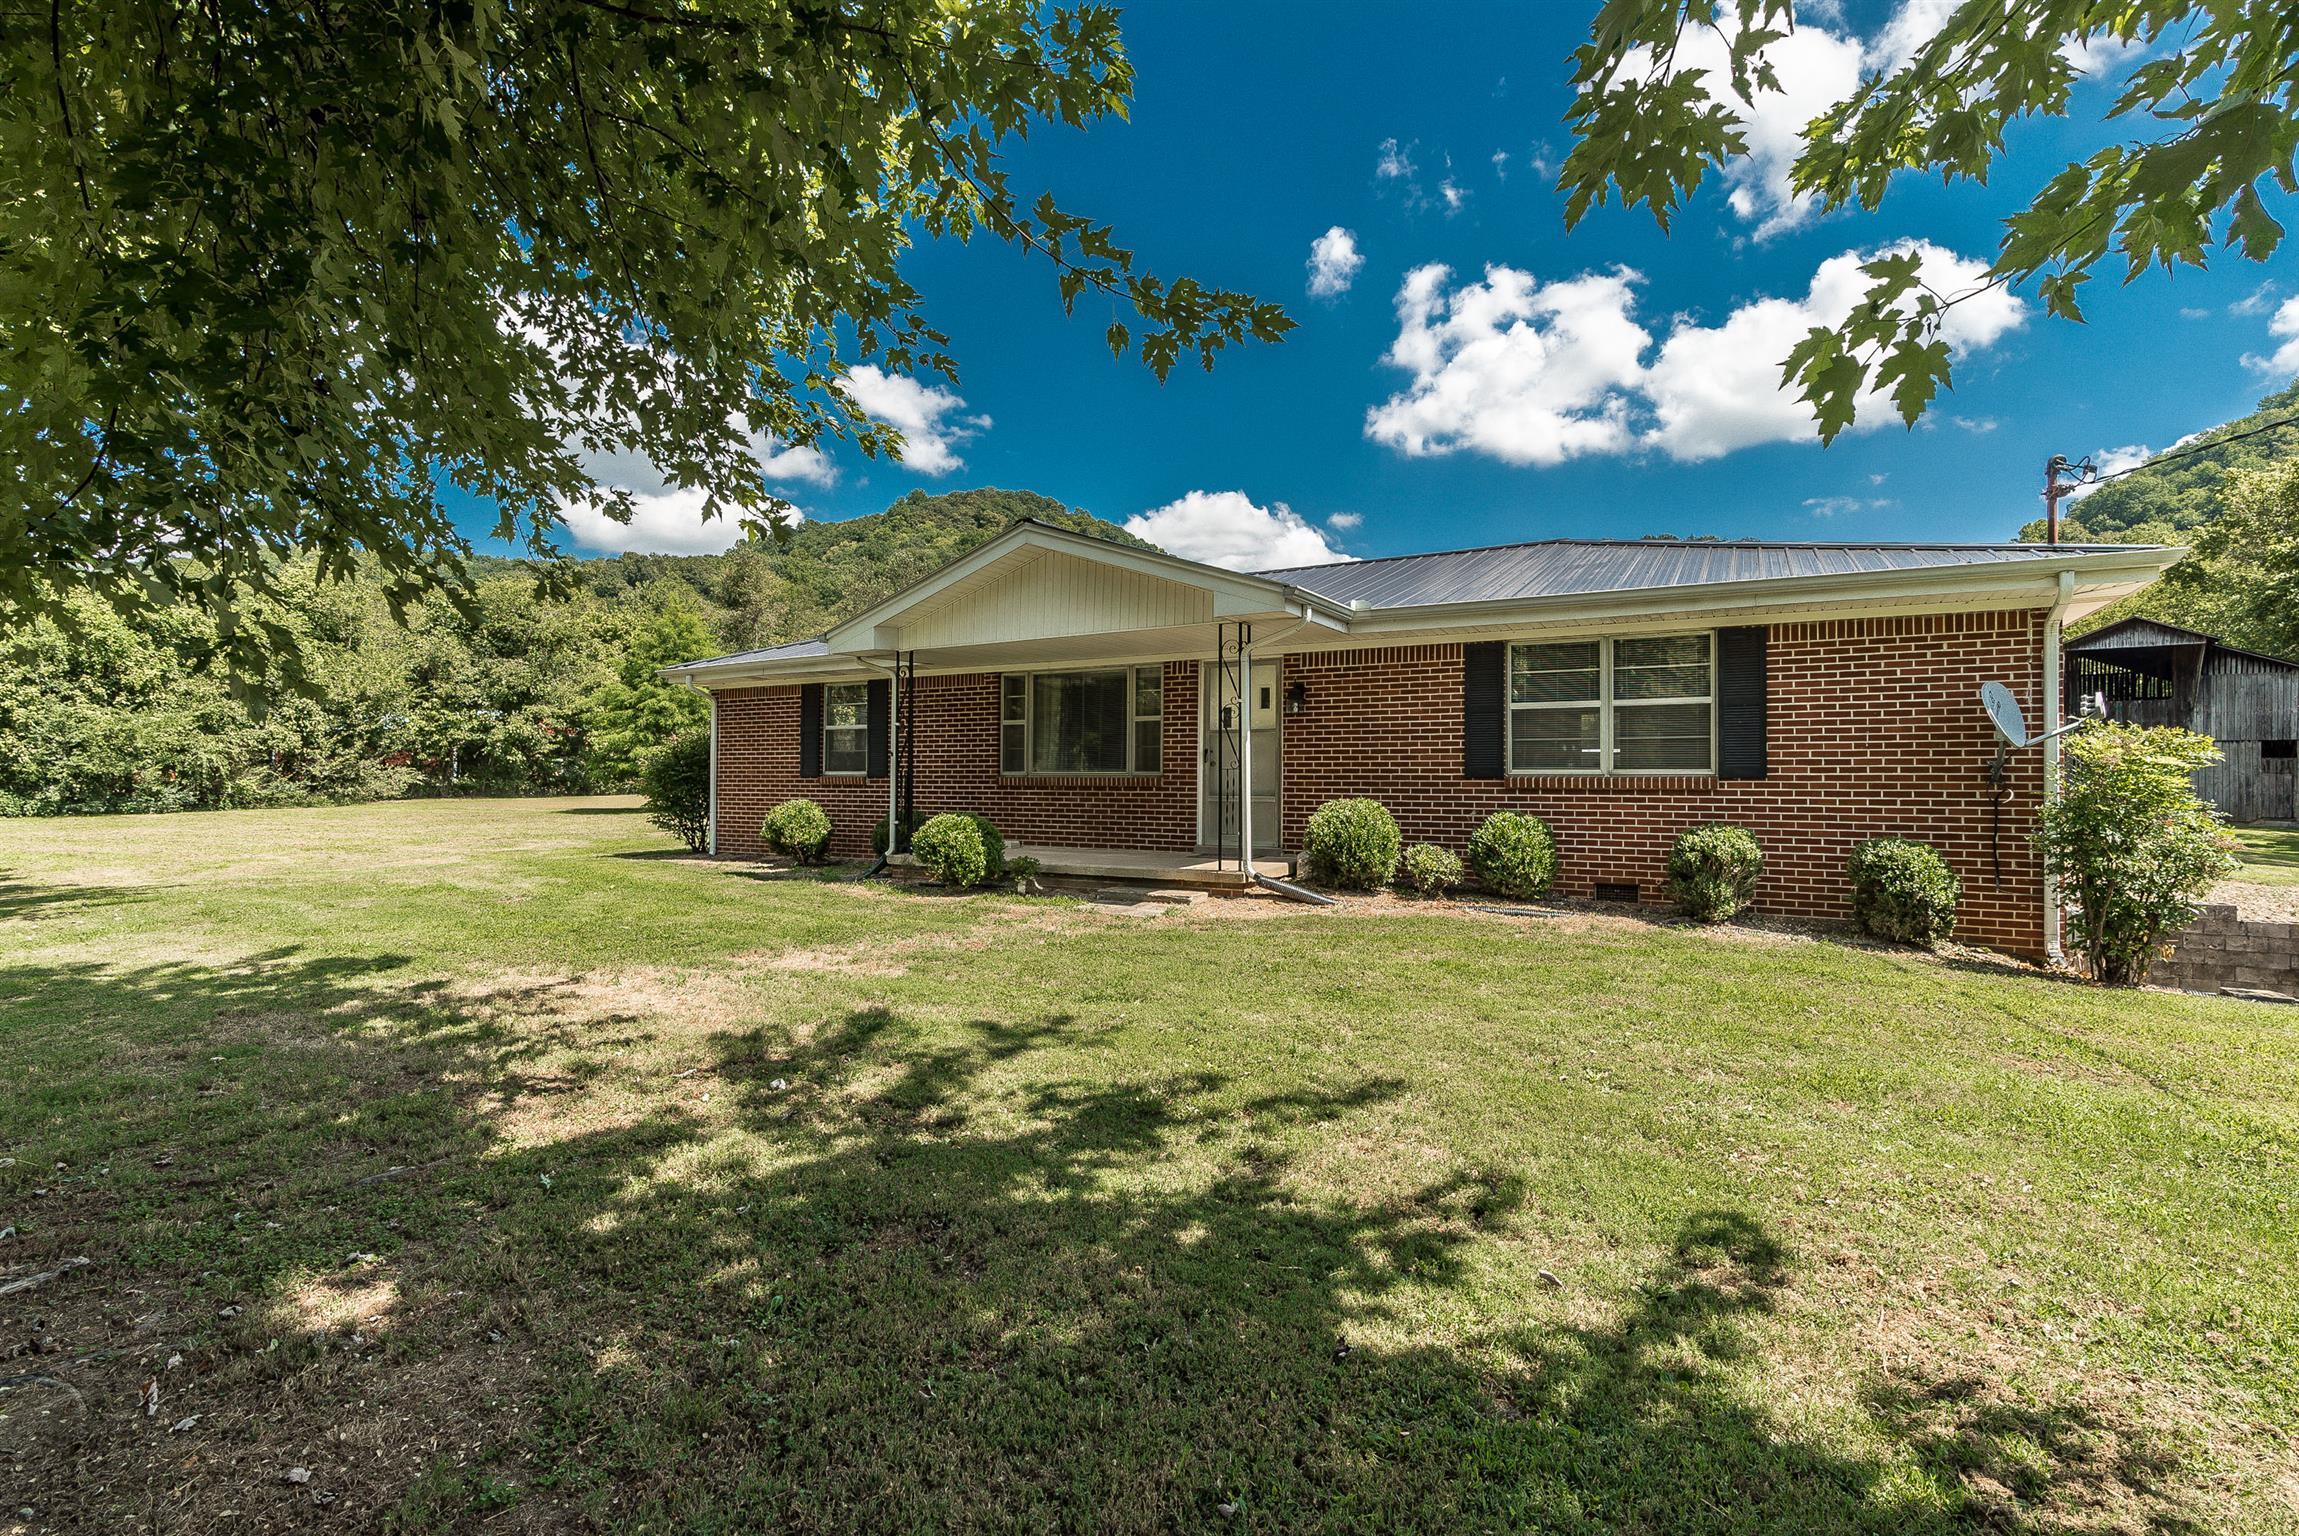 810 Dog Branch Rd, Dixon Springs, TN 37057 - Dixon Springs, TN real estate listing